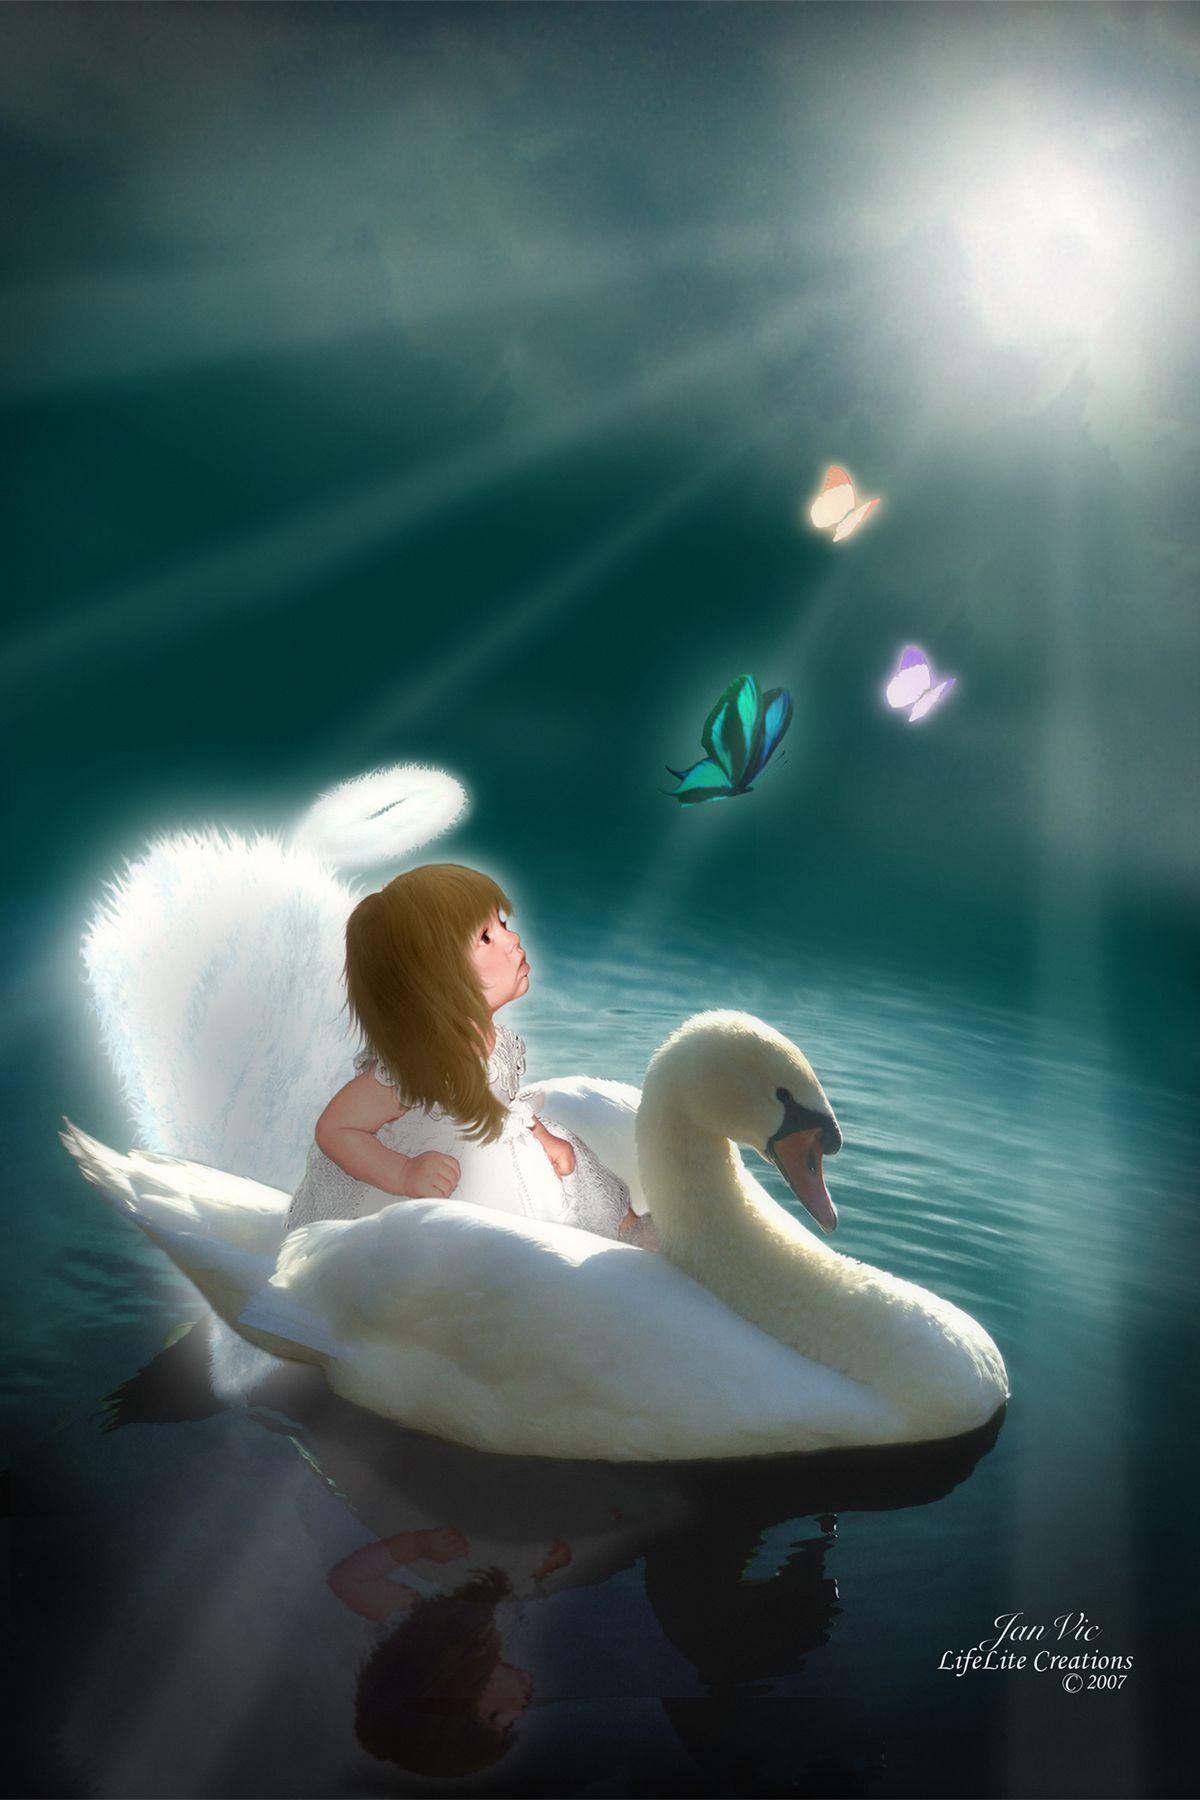 Angels . Lifelite Creations Prints 8x10 8x12 25.00. Create Custom